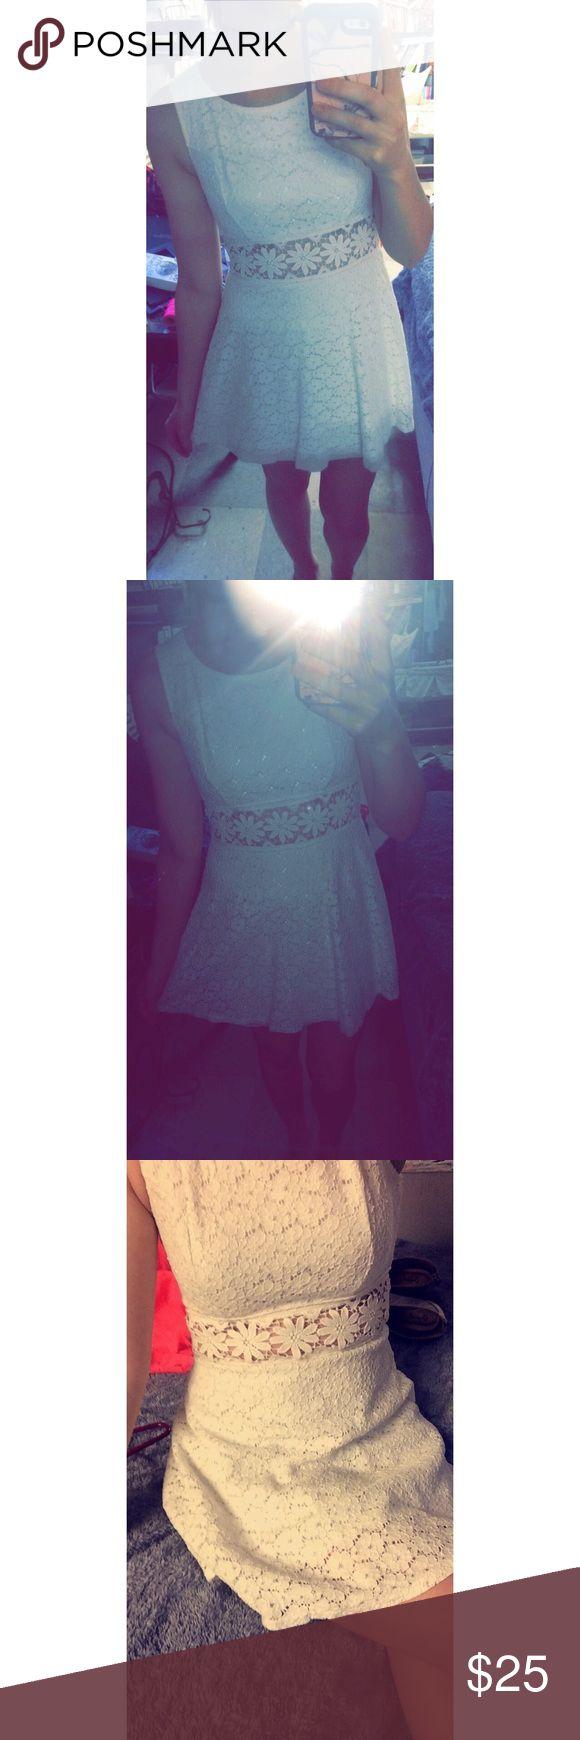 White cutout crochet dress Beautiful crochet dress with cutouts around the waist. Size small. Bought from Deb shops. Like new. Deb Dresses Mini